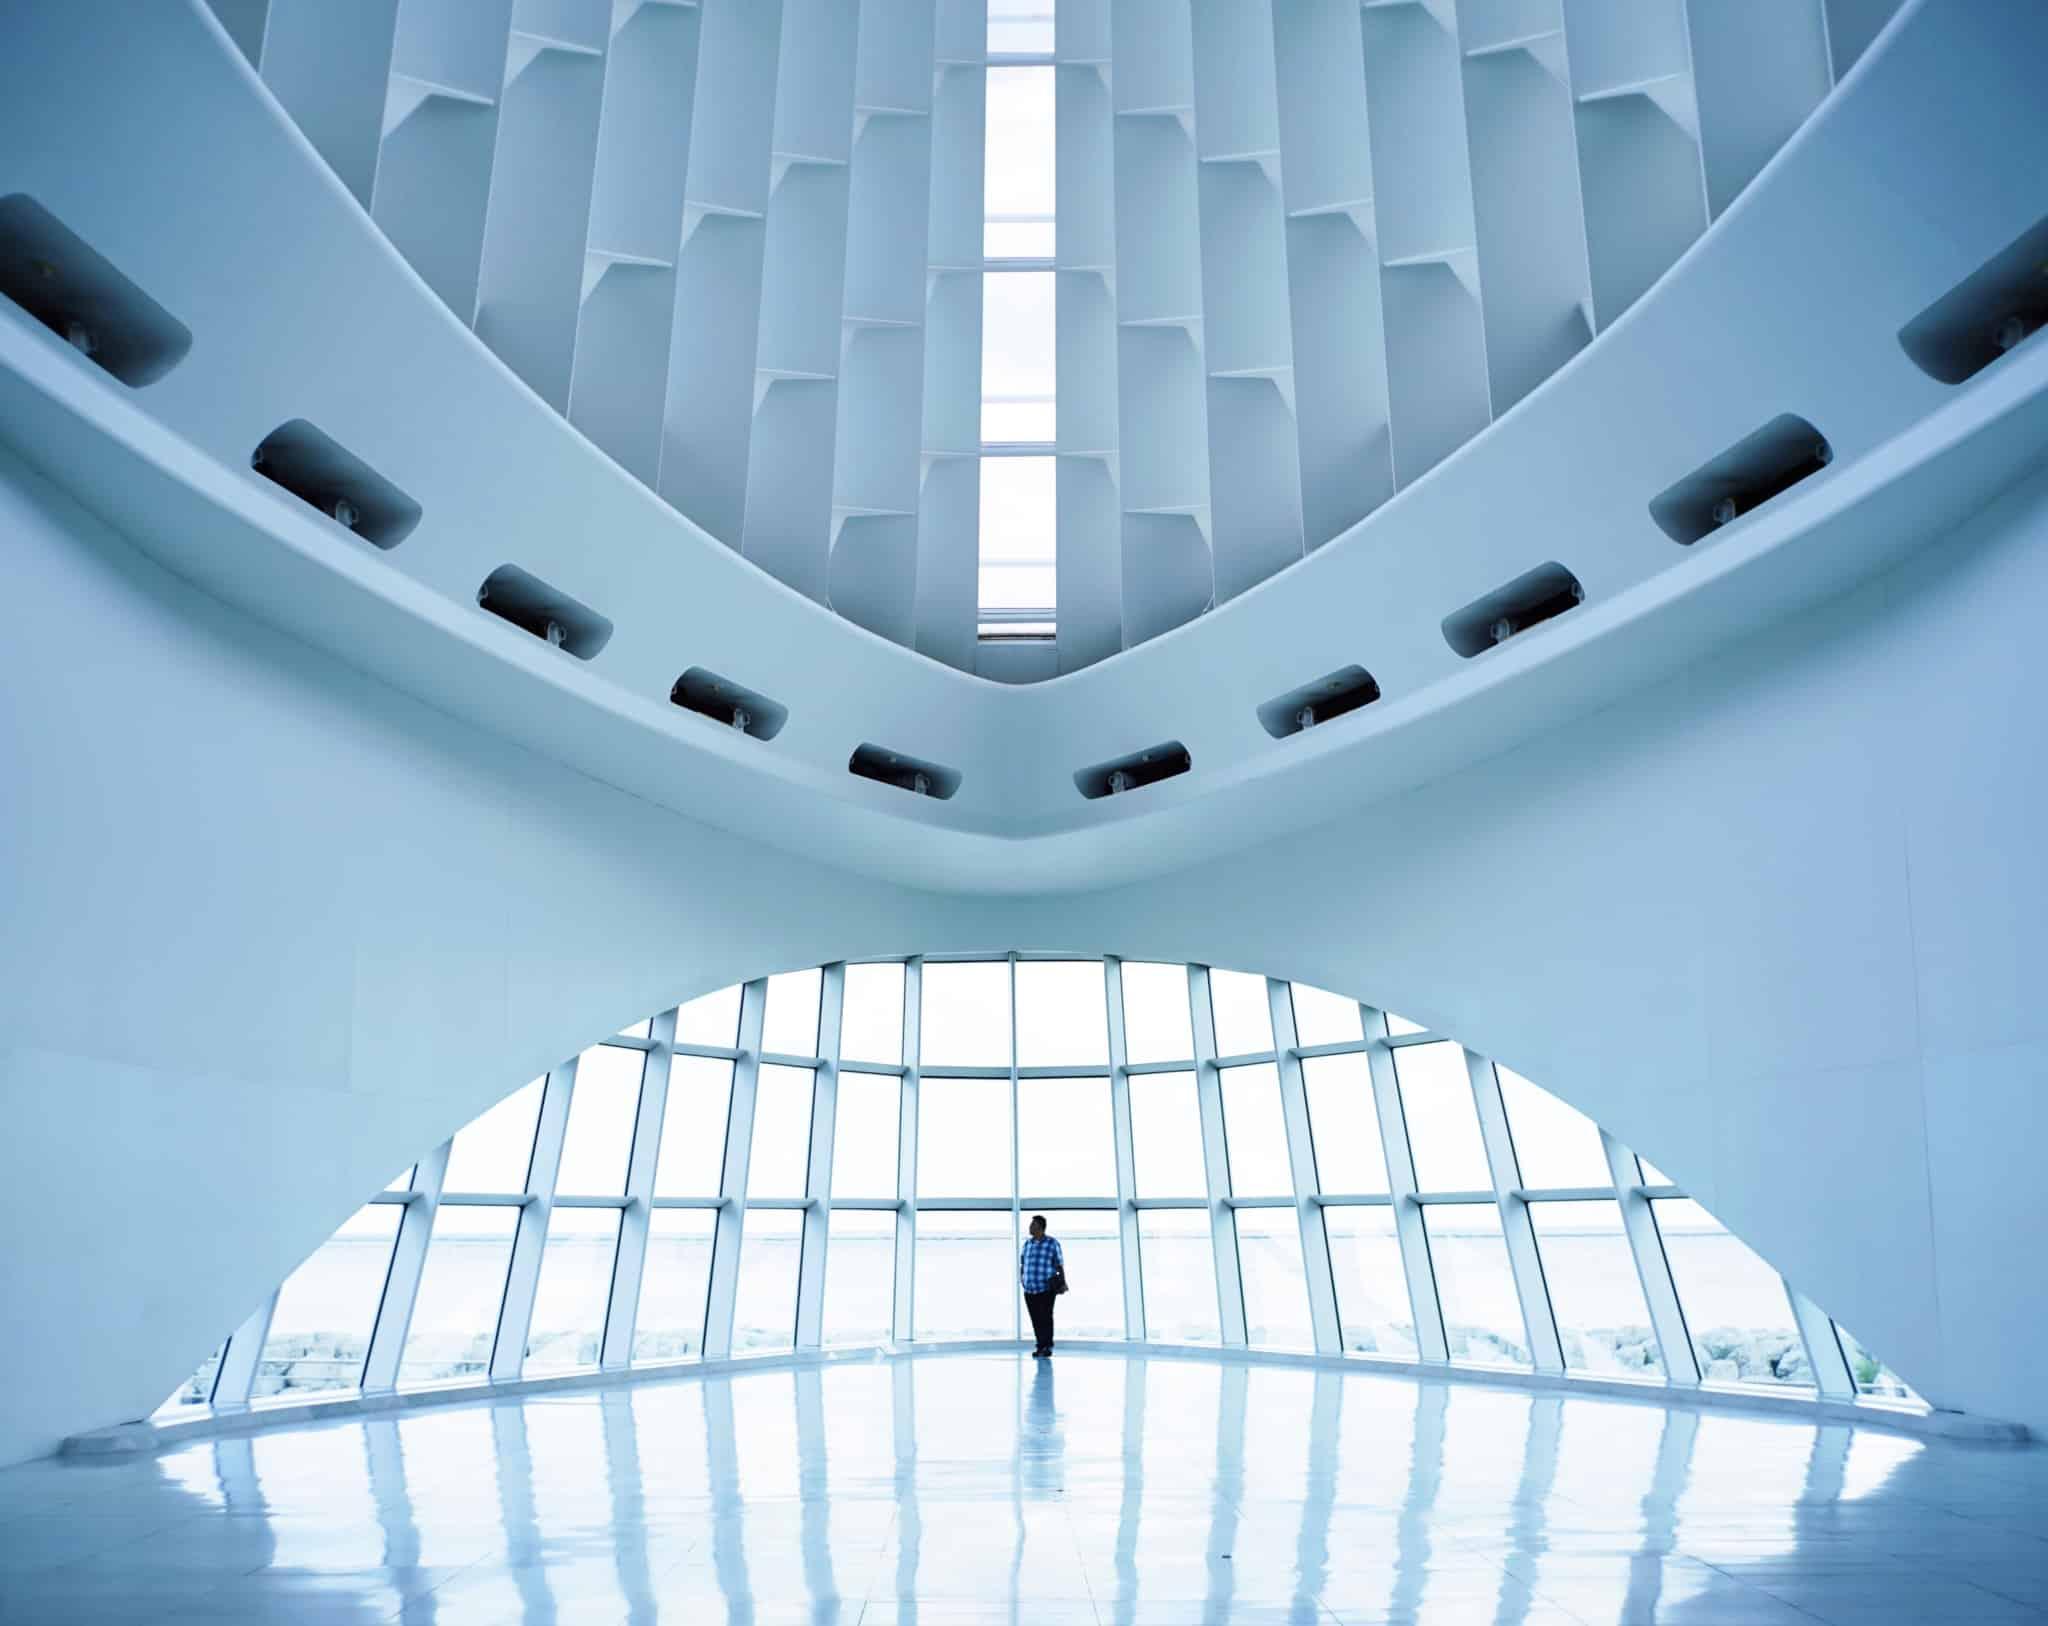 museu contemporâneo branco